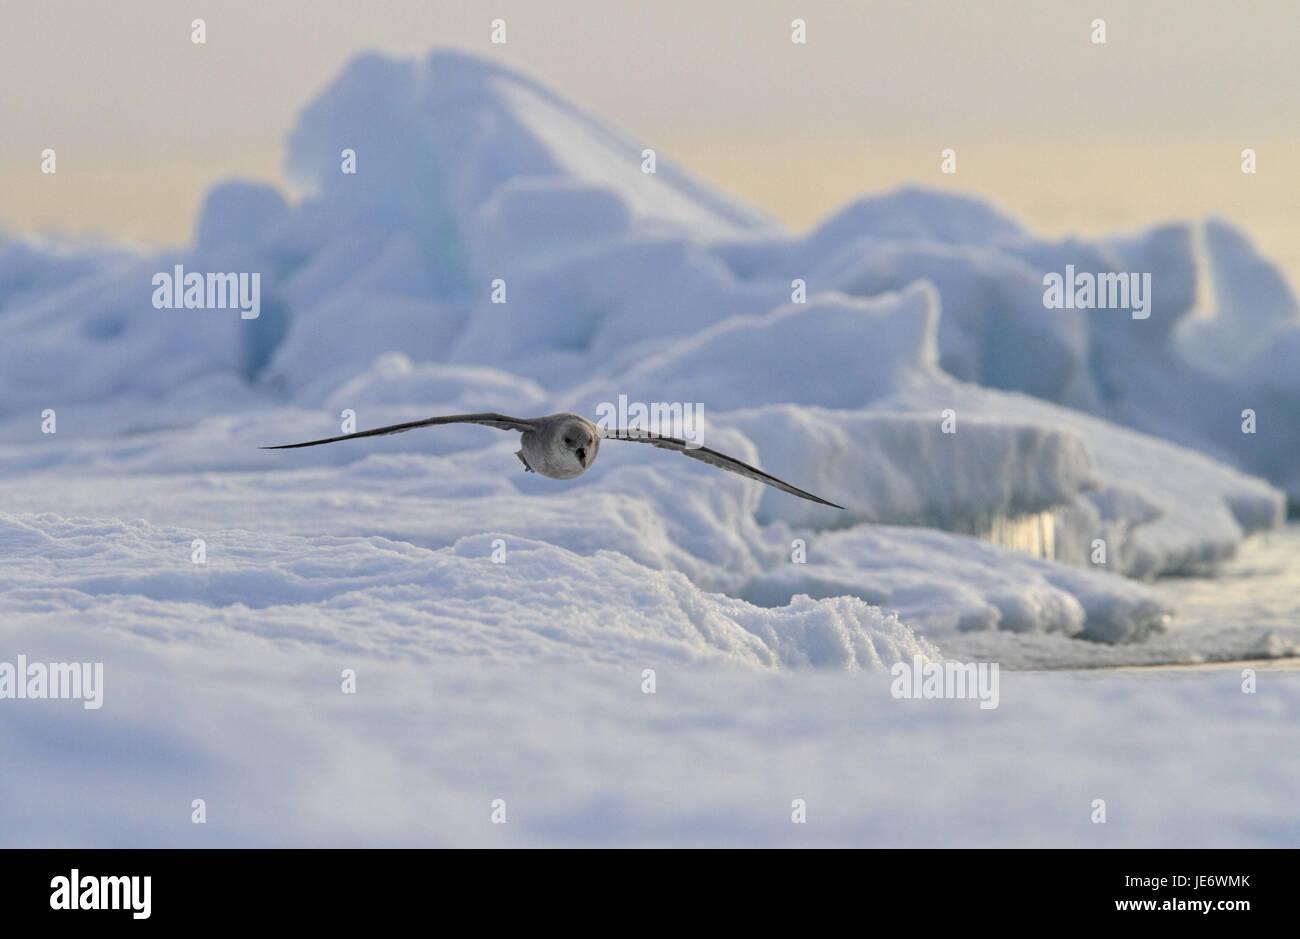 North America, Canada, Nordkanada, Nunavut, Baffin Iceland, Pond, Inlet, Eclipse sound, fulmar, Fulmarus gacialis, - Stock Image